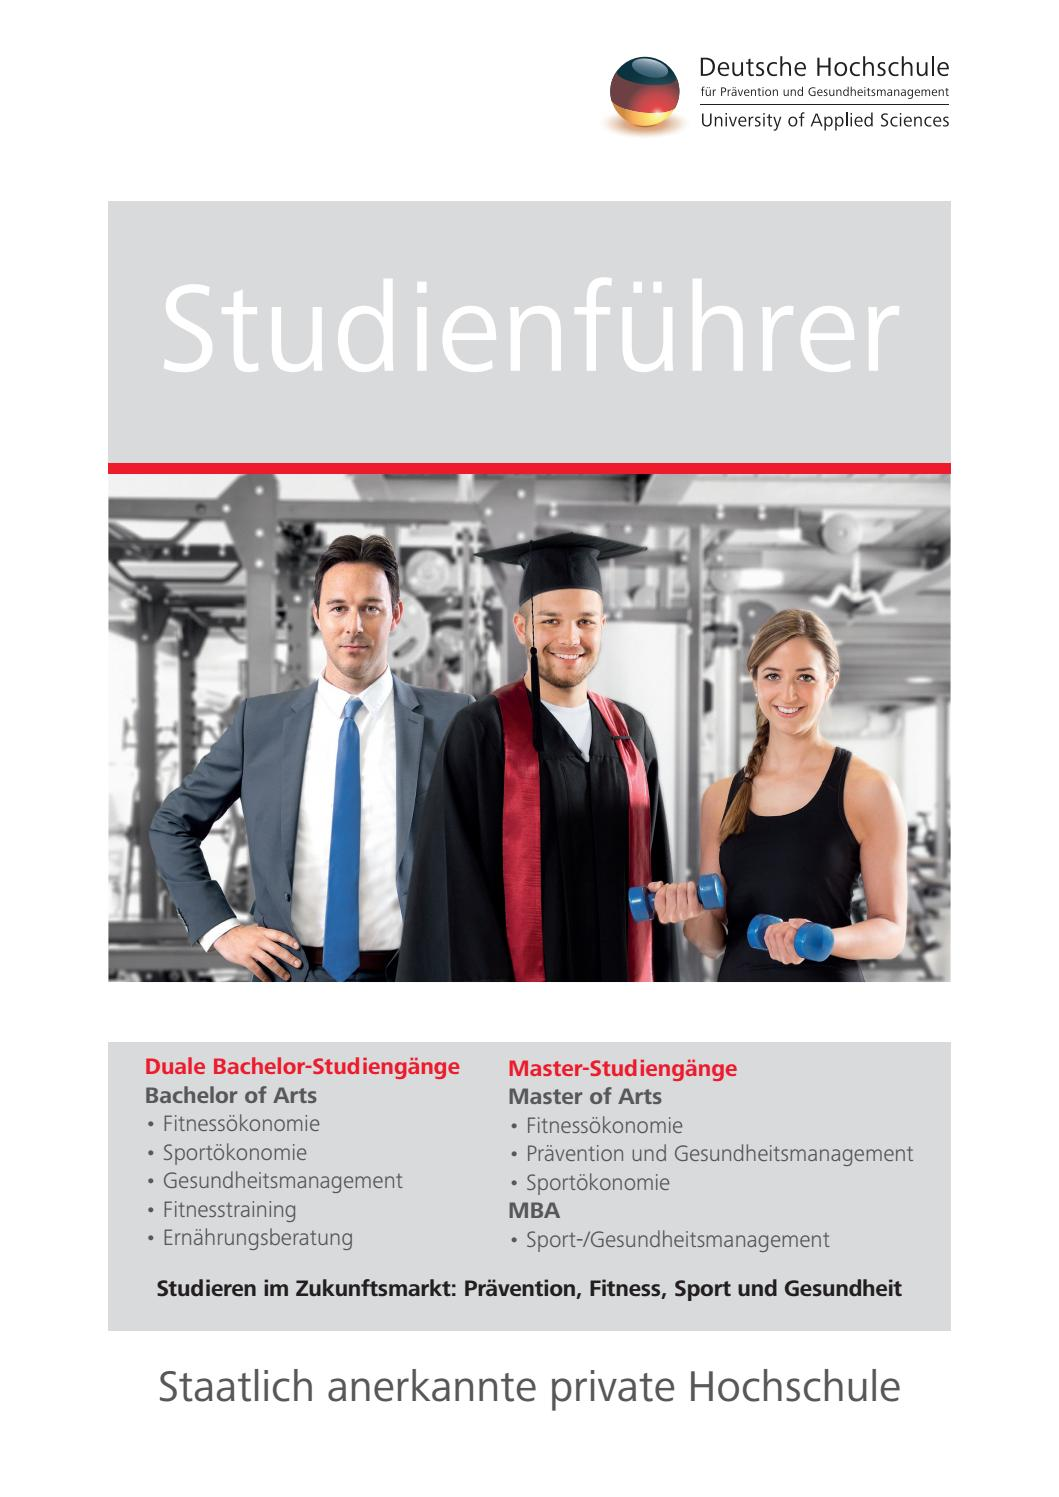 Studienführer der DHfPG by DHfPG / BSA-Akademie - issuu